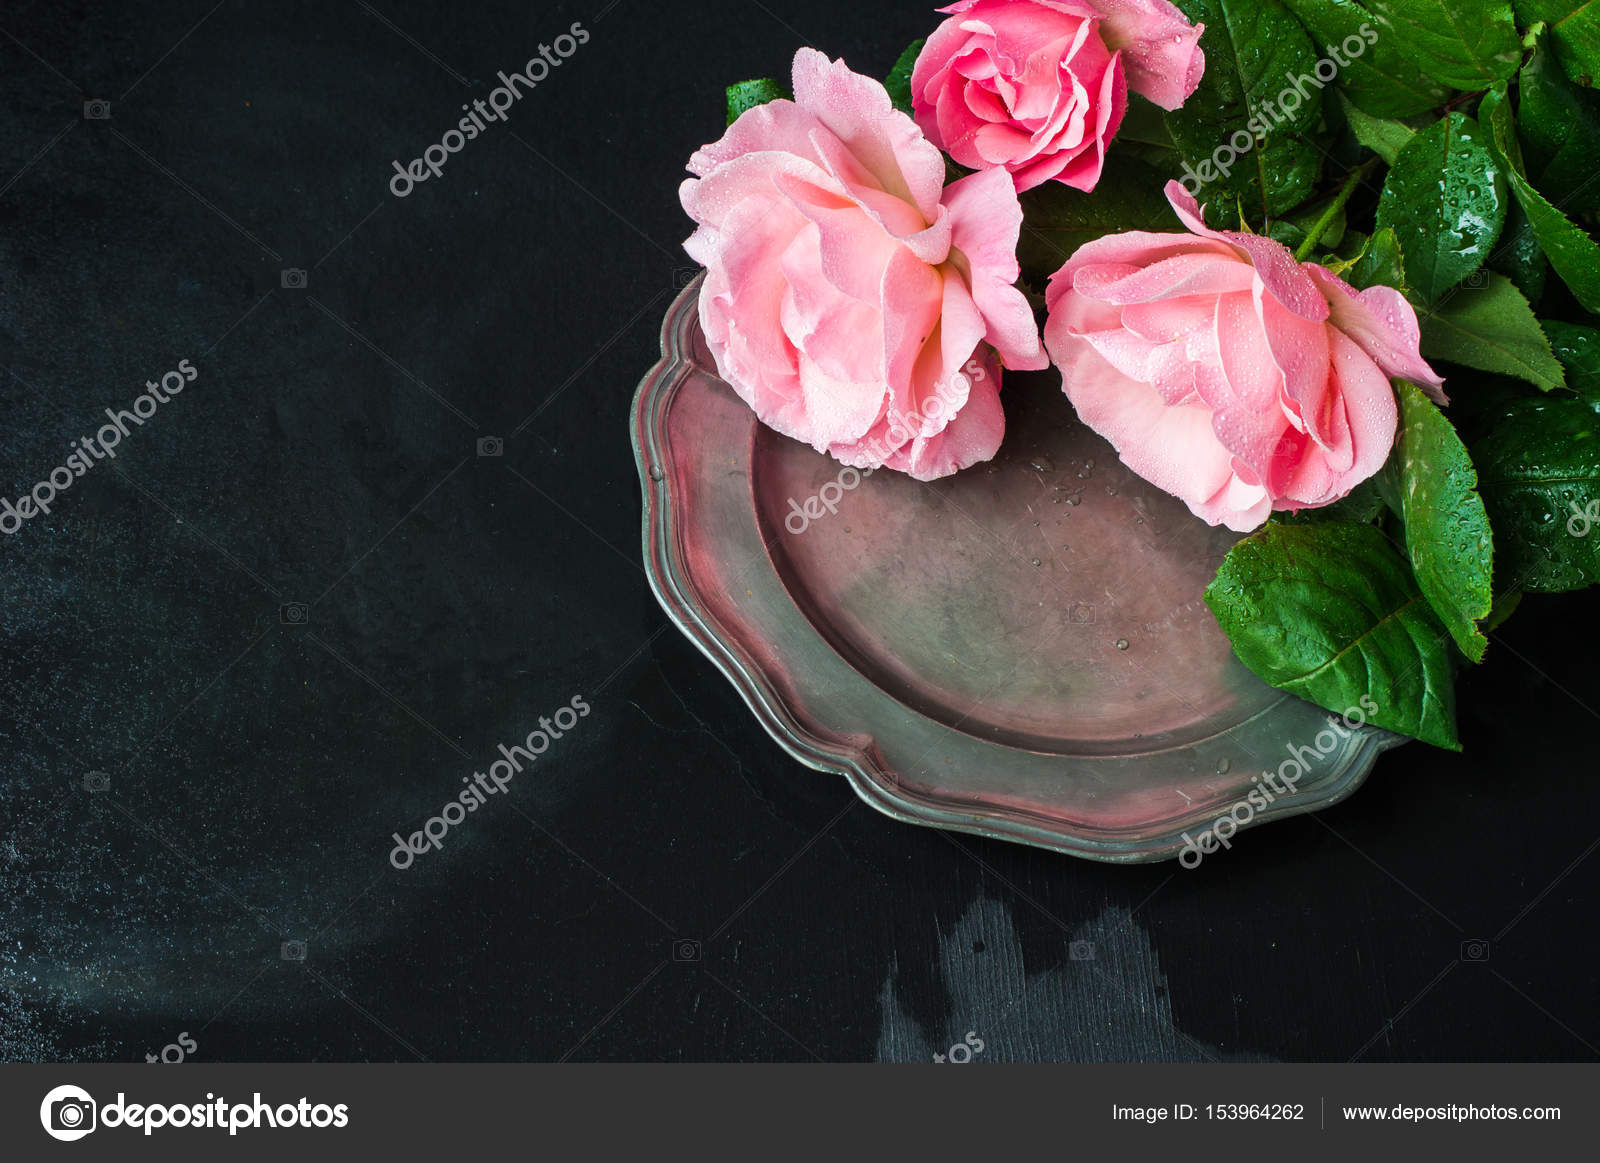 Sommer Tischdekoration Mit Rosen Stockfoto C Elet 1 153964262